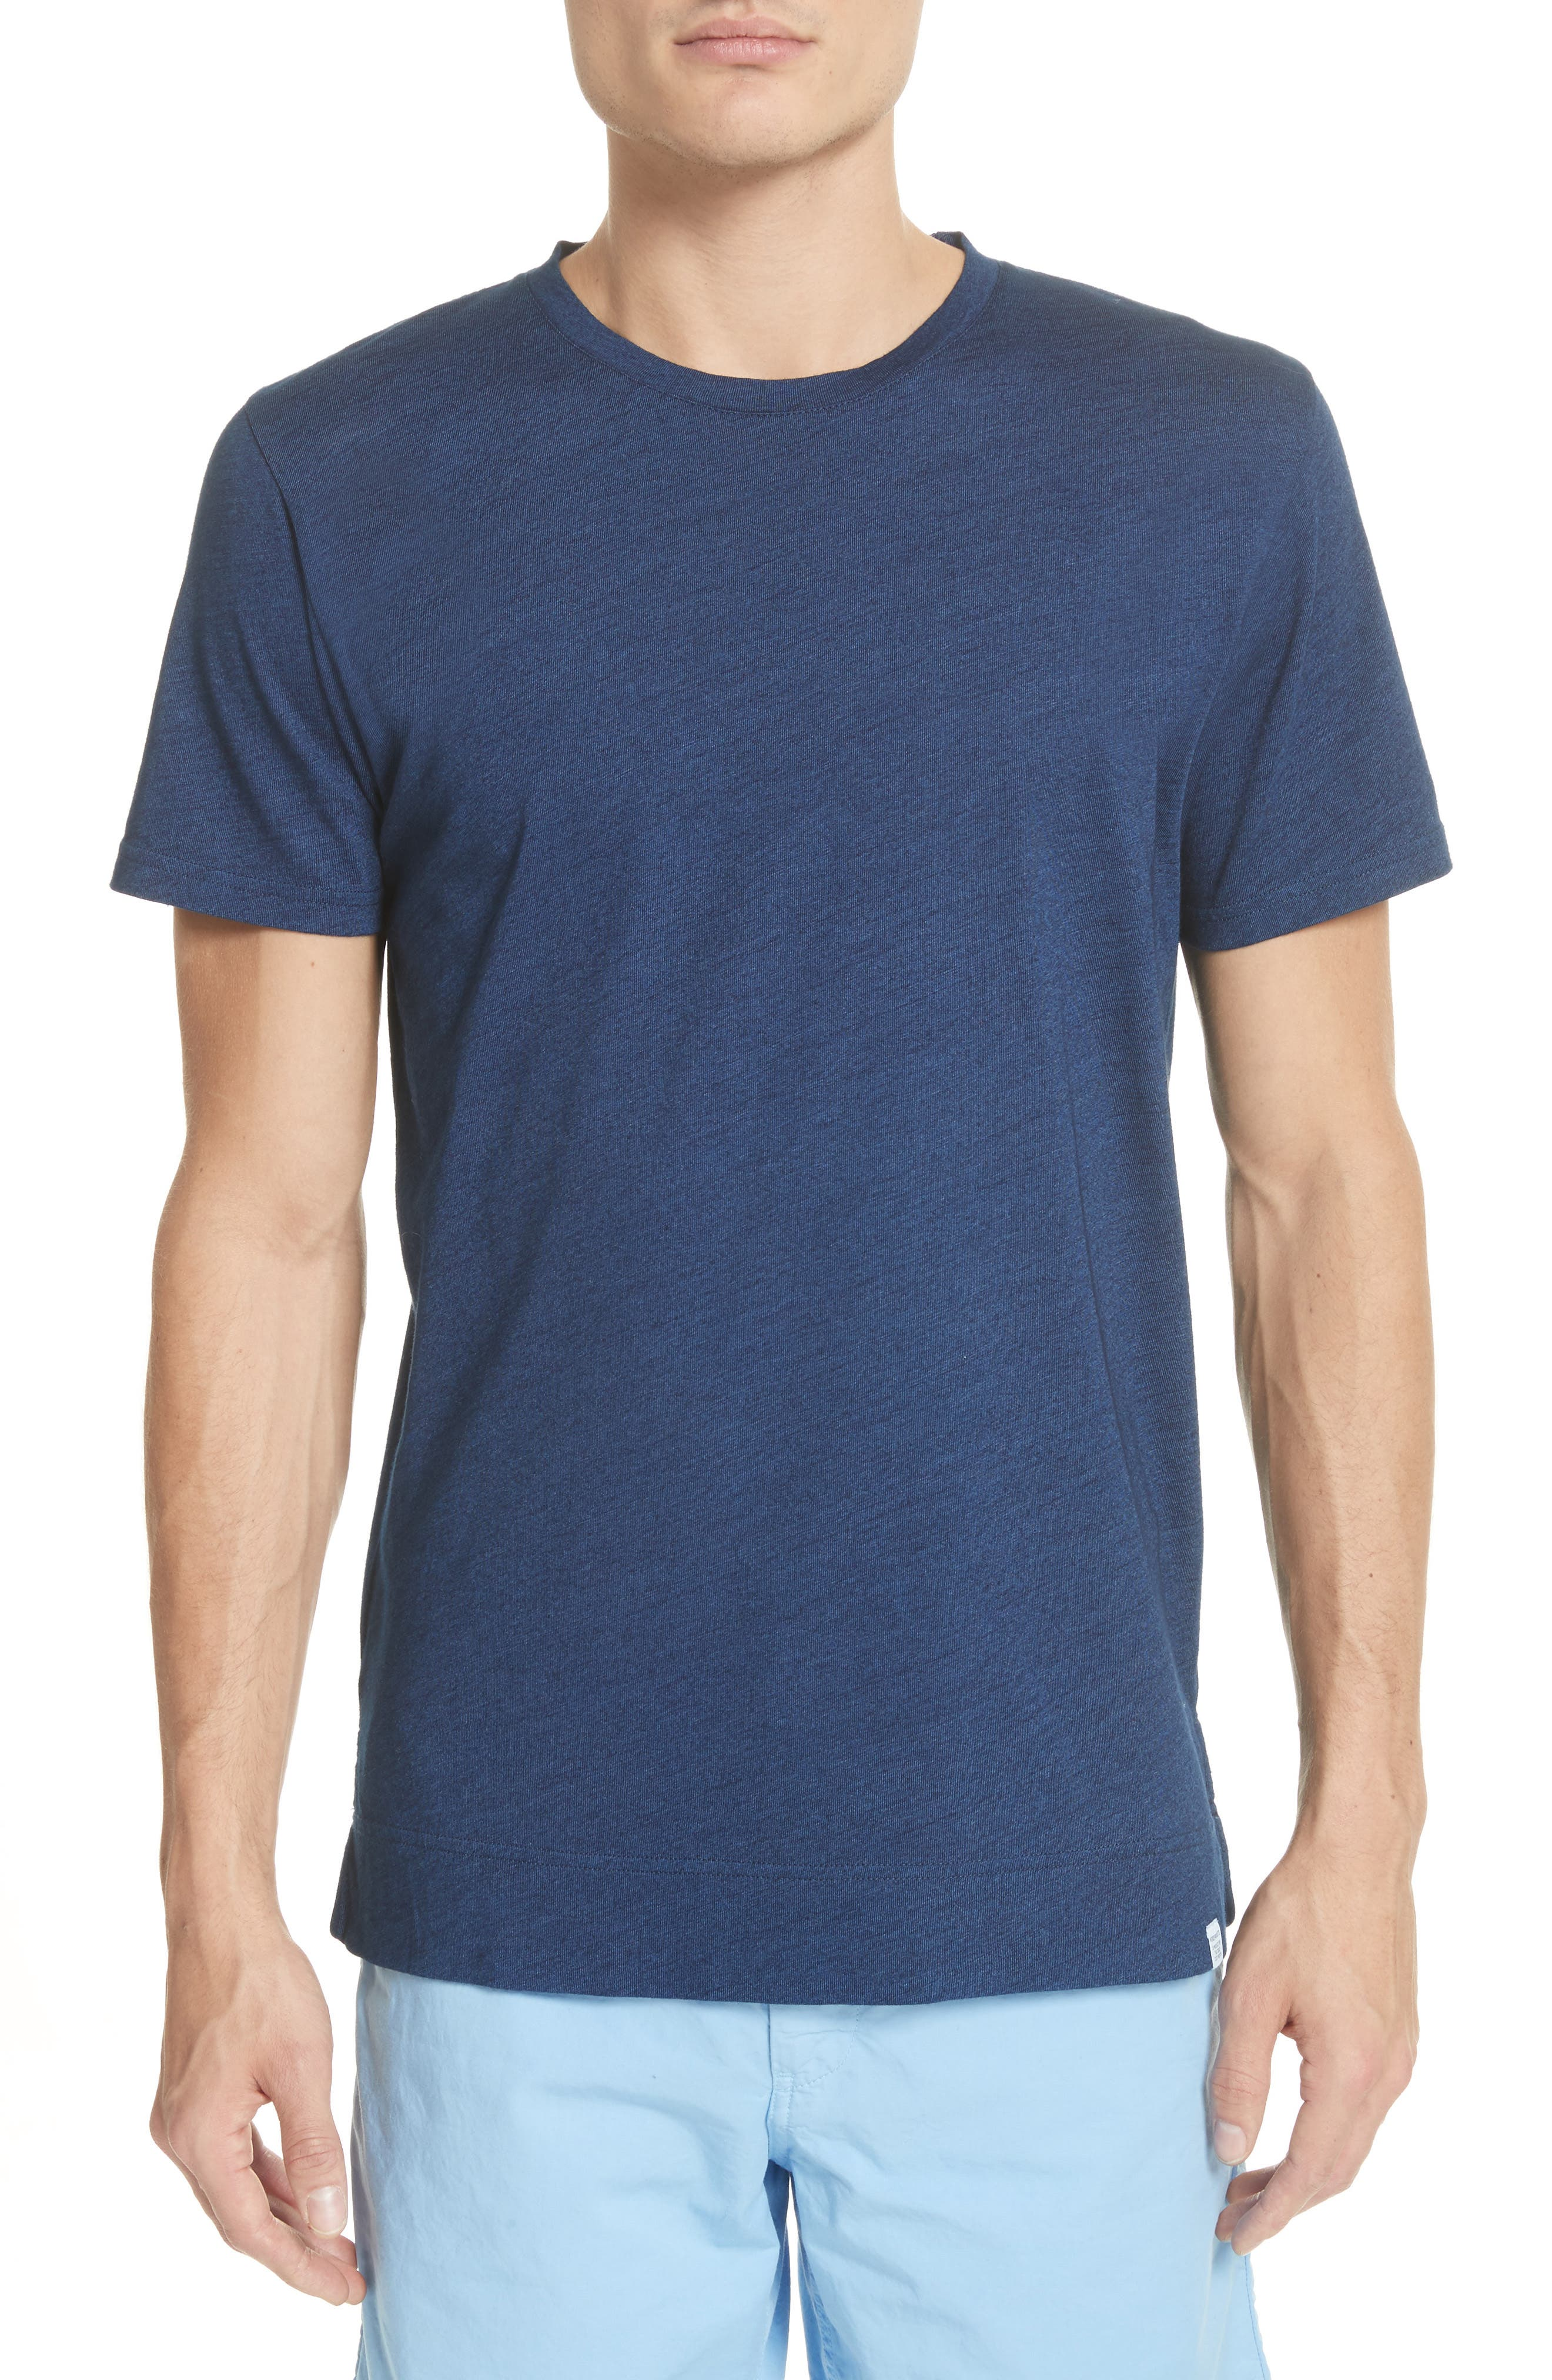 Niels Indigo T-Shirt,                             Main thumbnail 1, color,                             Indigo